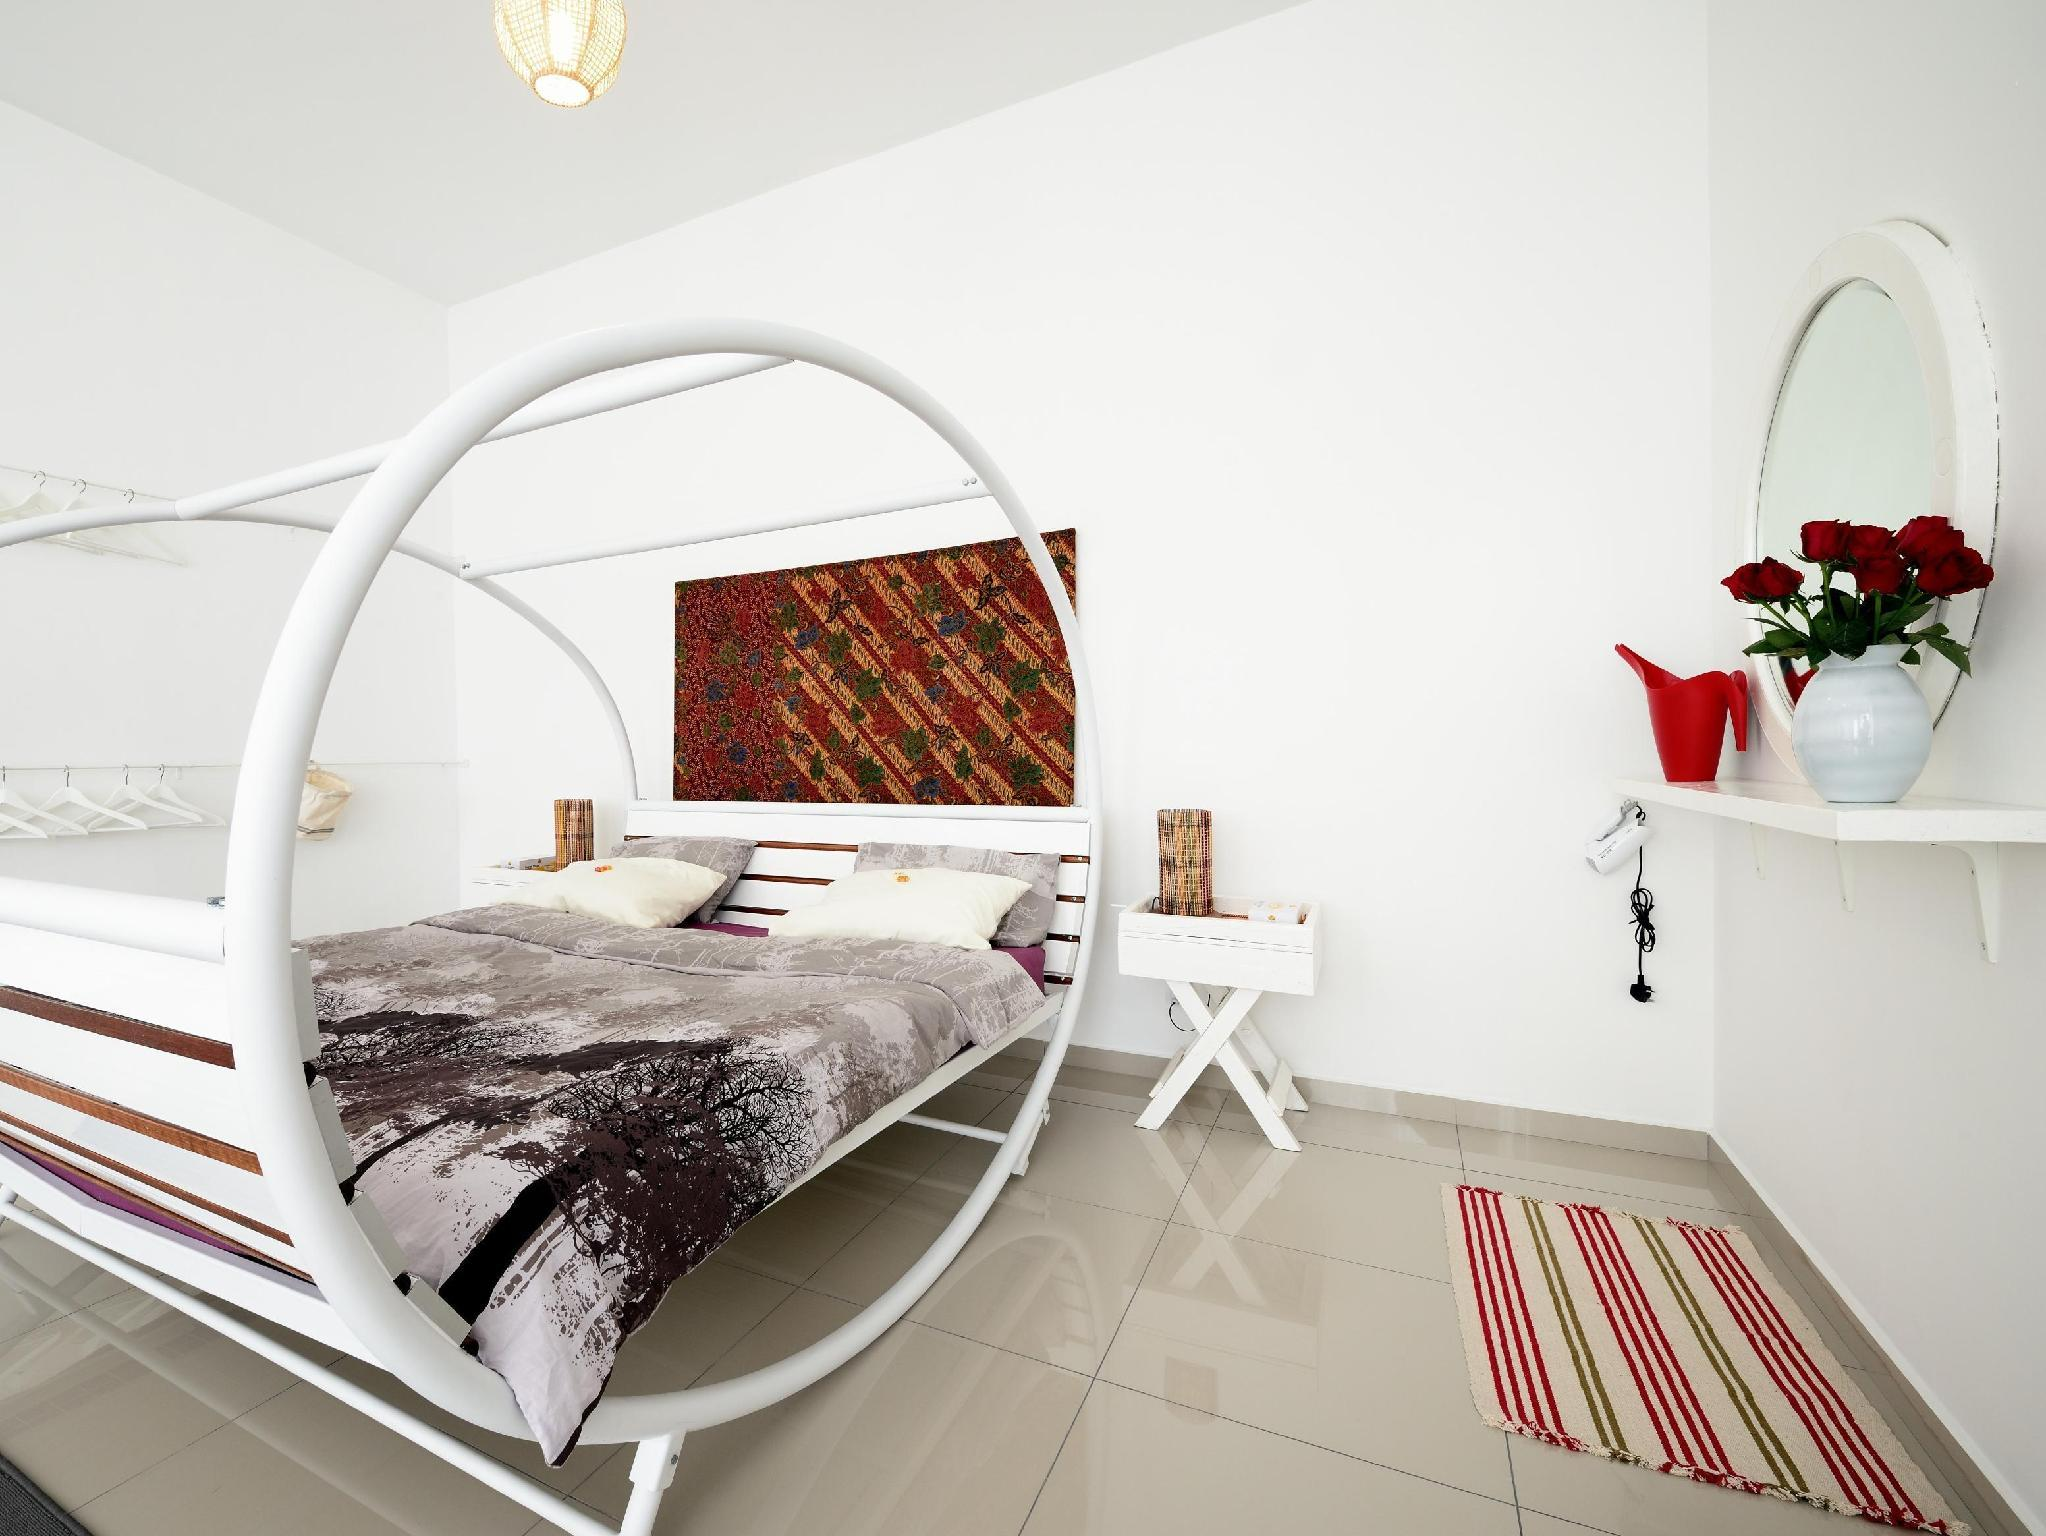 Eco Bed and Breakfast, Johor Bahru